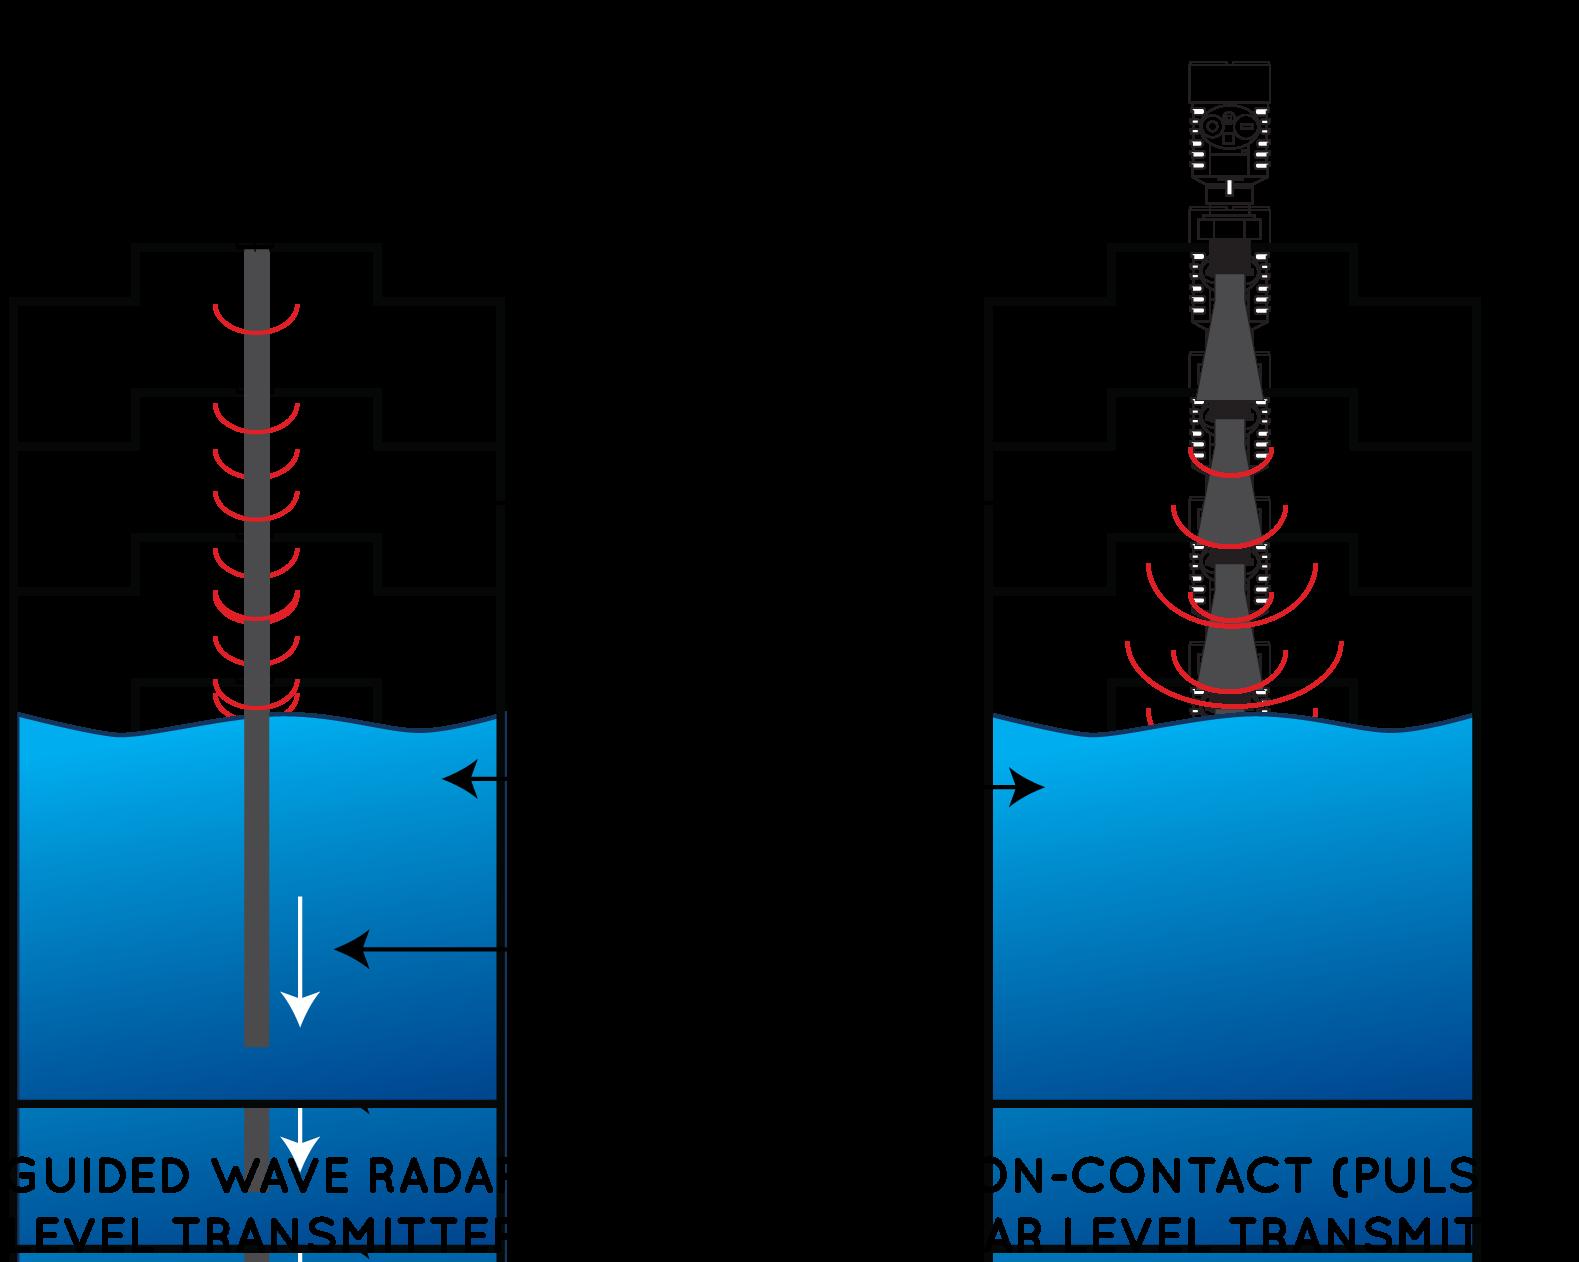 Guided Wave Radar Vs Pulse Radar Level Transmitters Flo